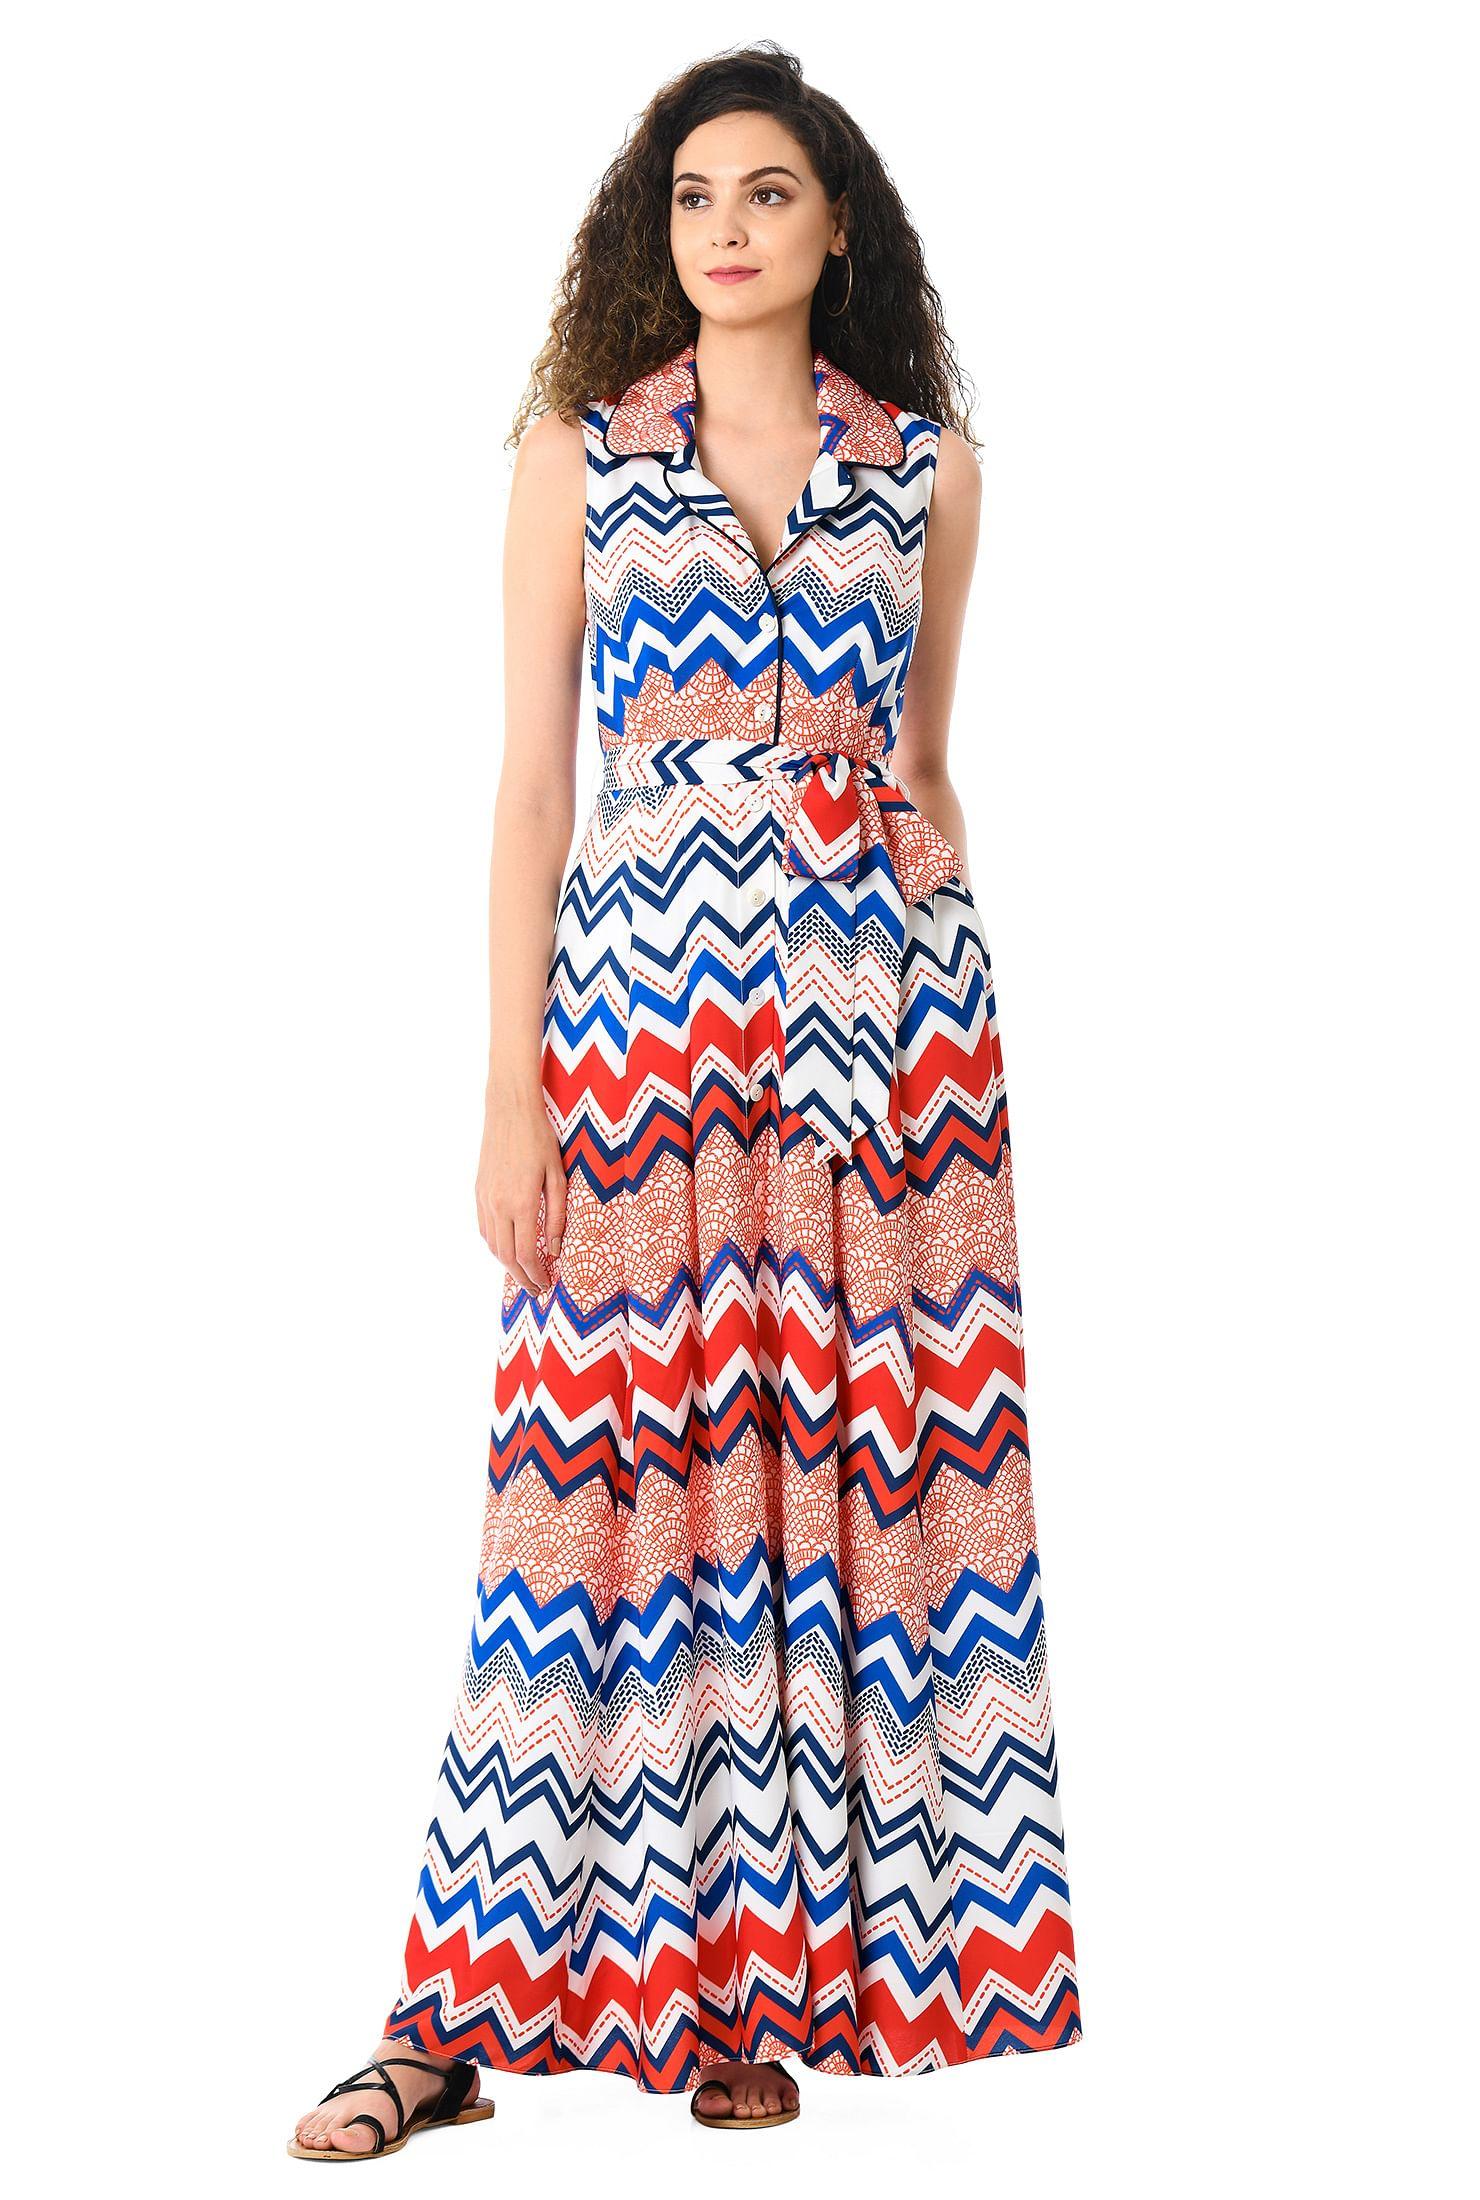 718e2a64e89d Women's Fashion Clothing 0-36W and Custom